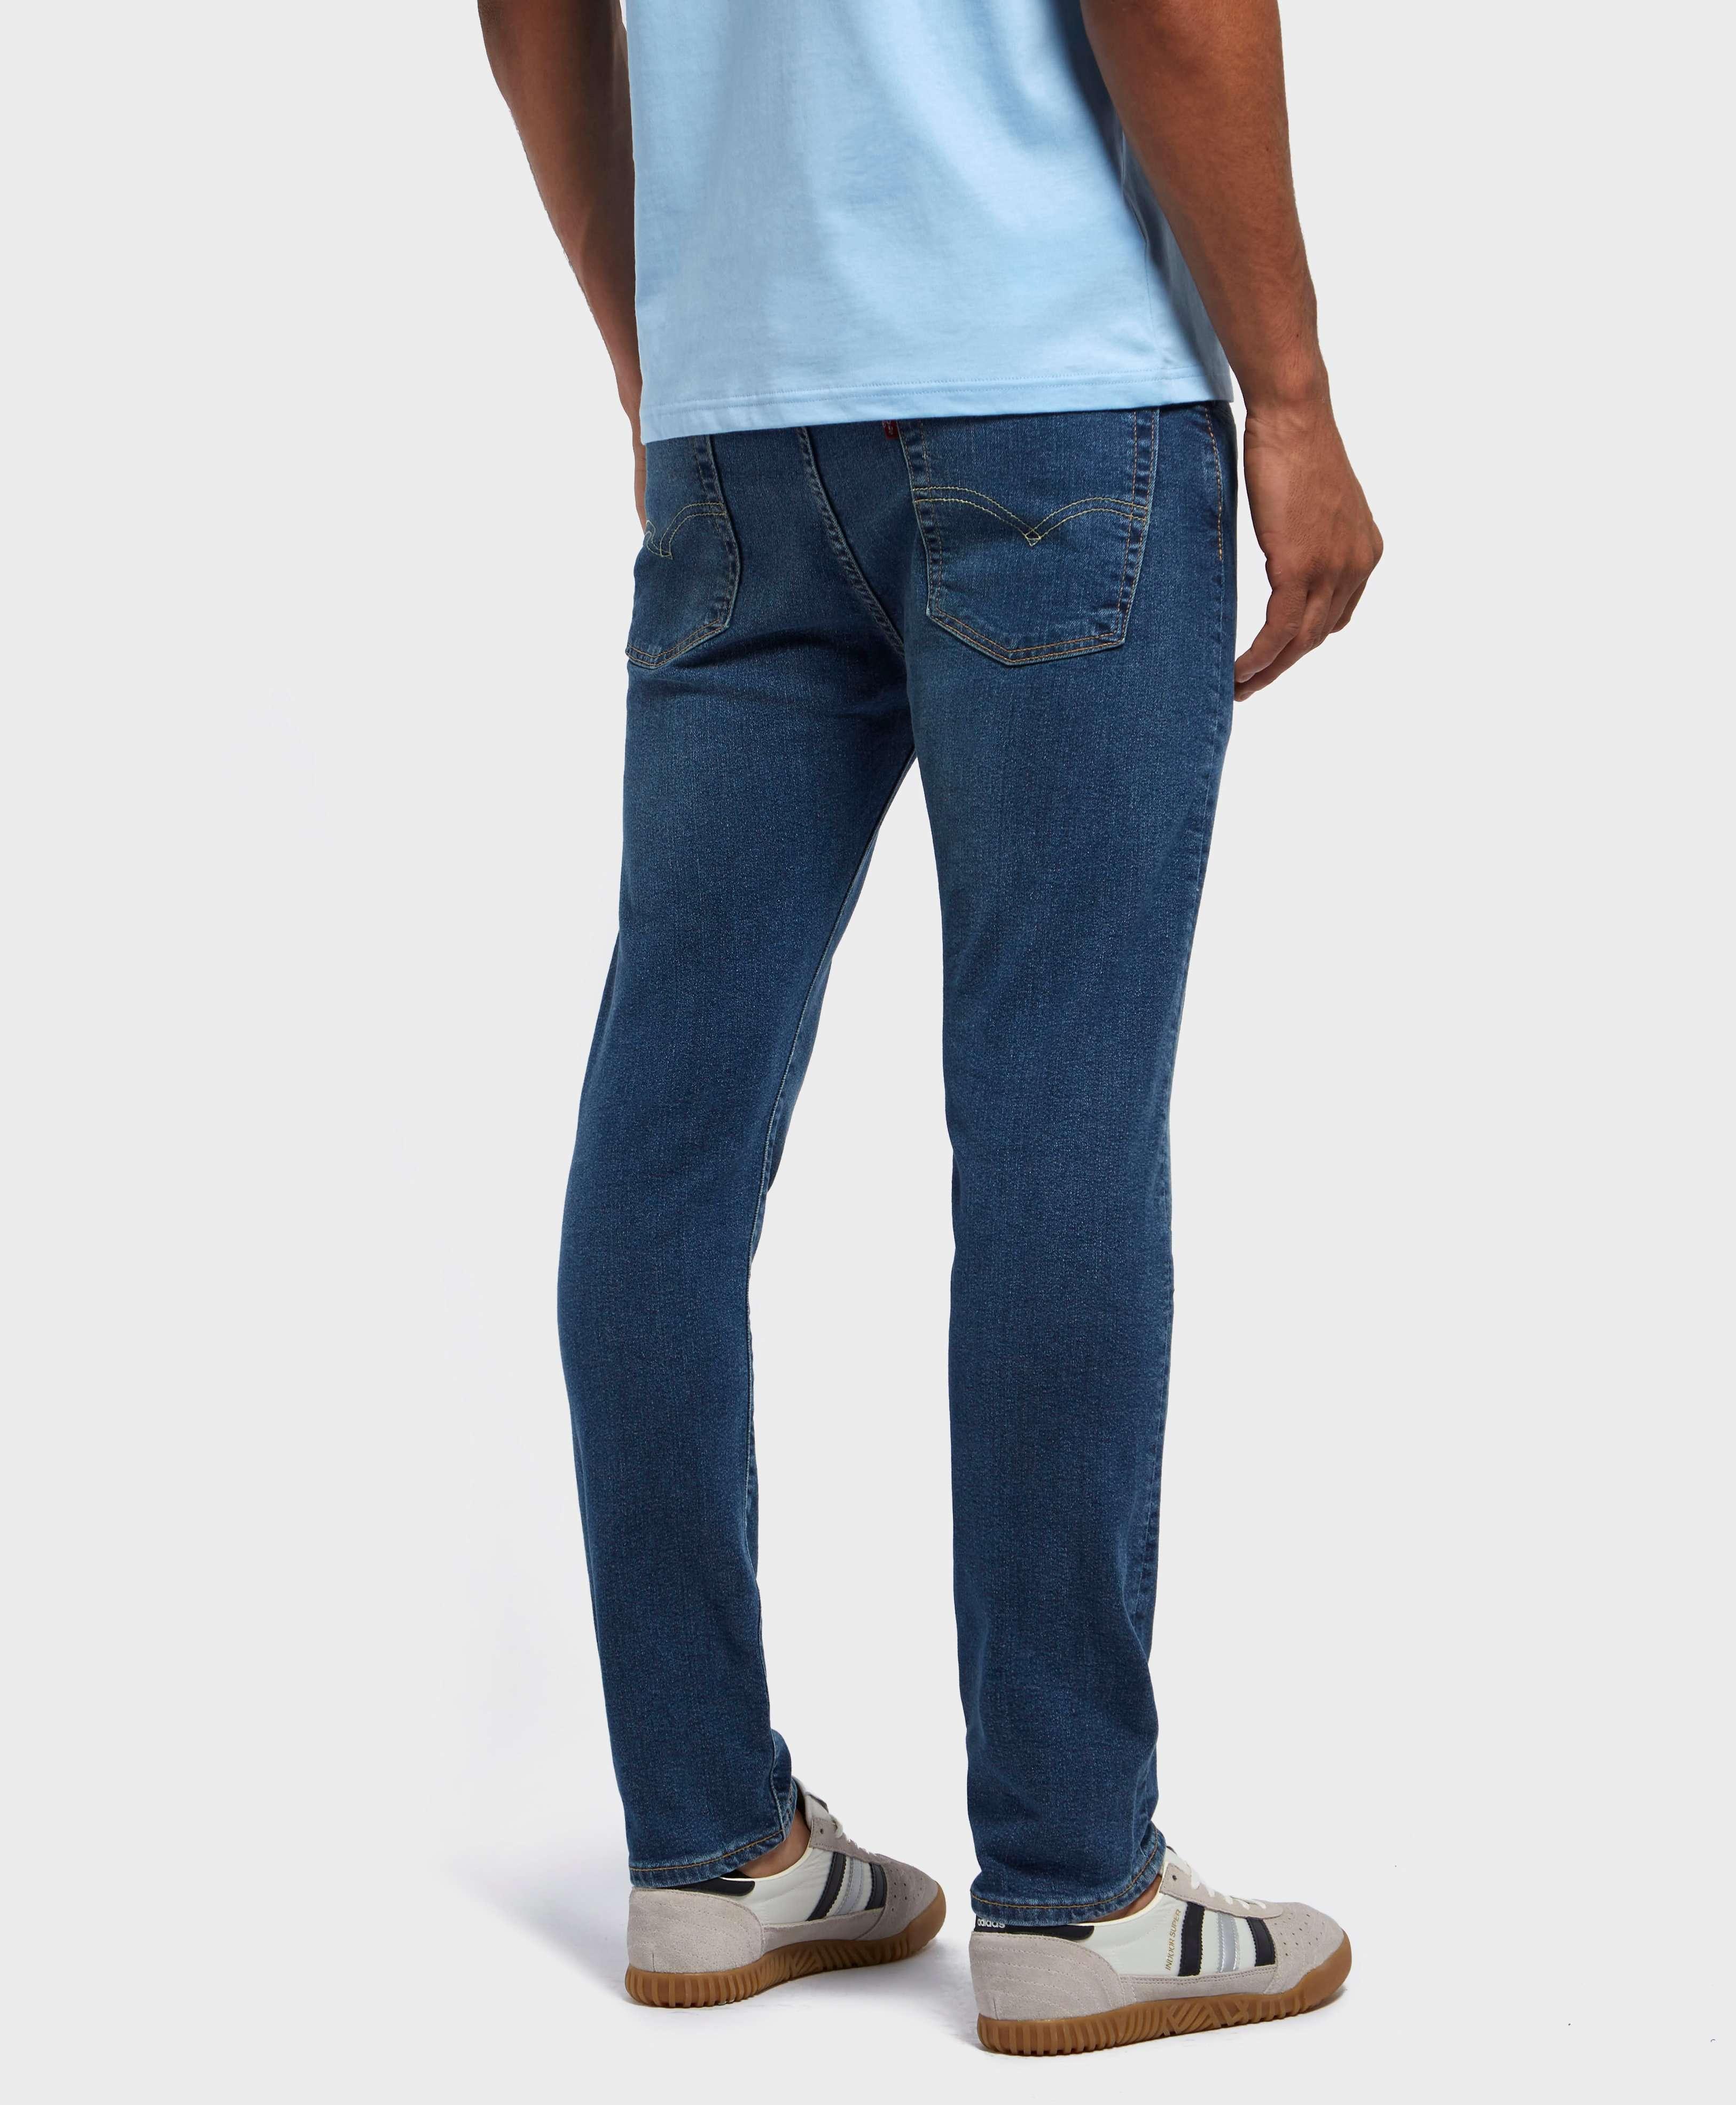 Levis 510 Stretch Skinny Jeans